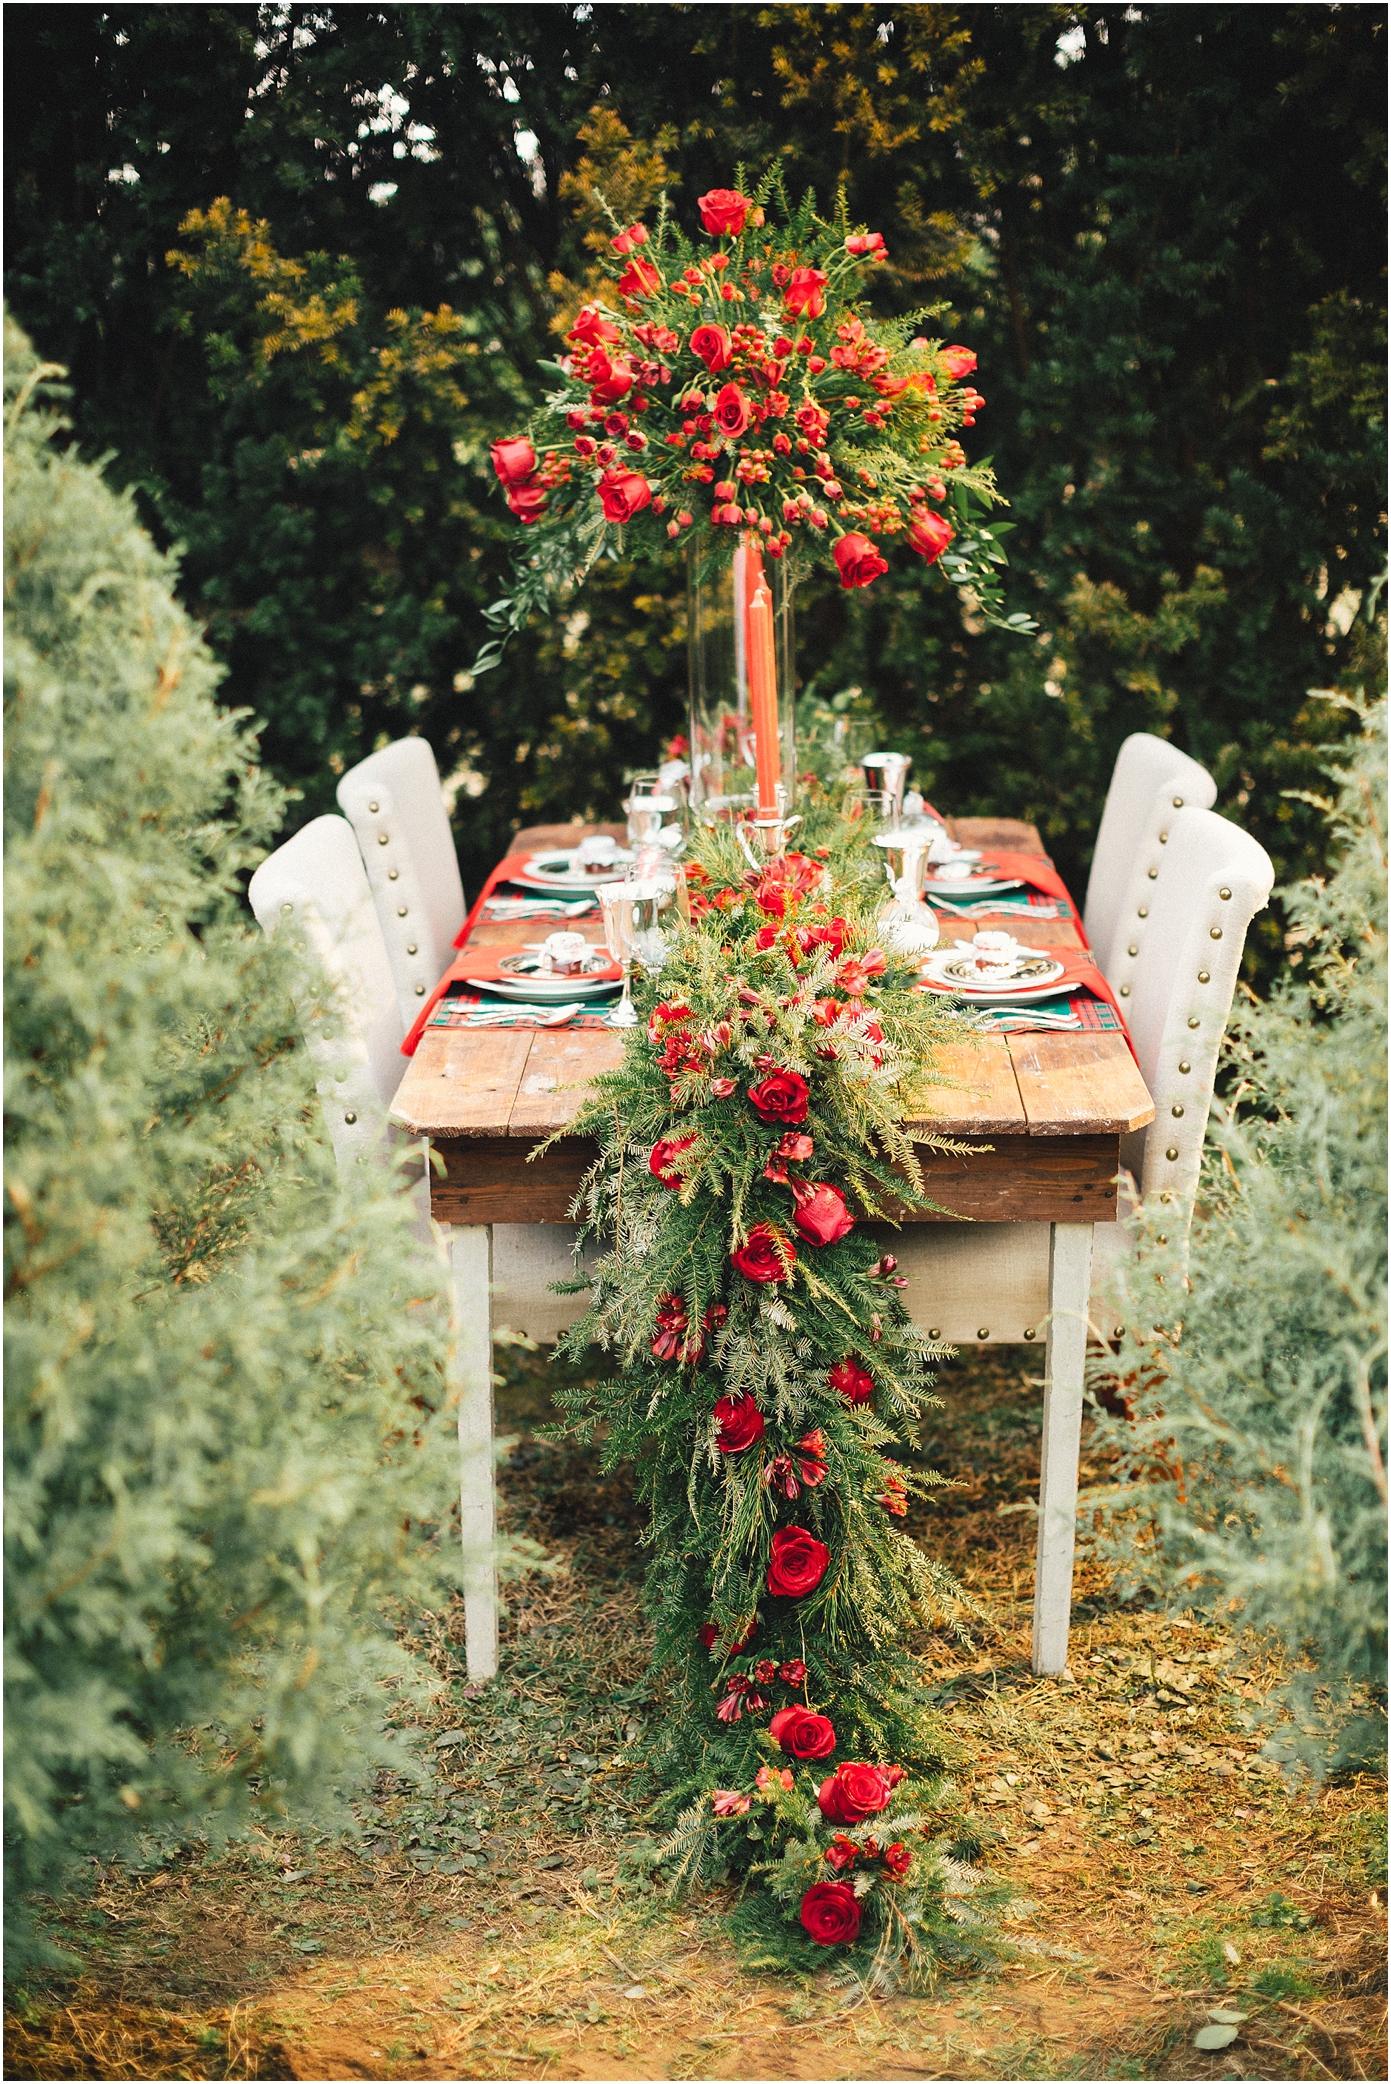 location bluebird christmas tree farm christmas tablescape ideas - Bluebird Christmas Tree Farm